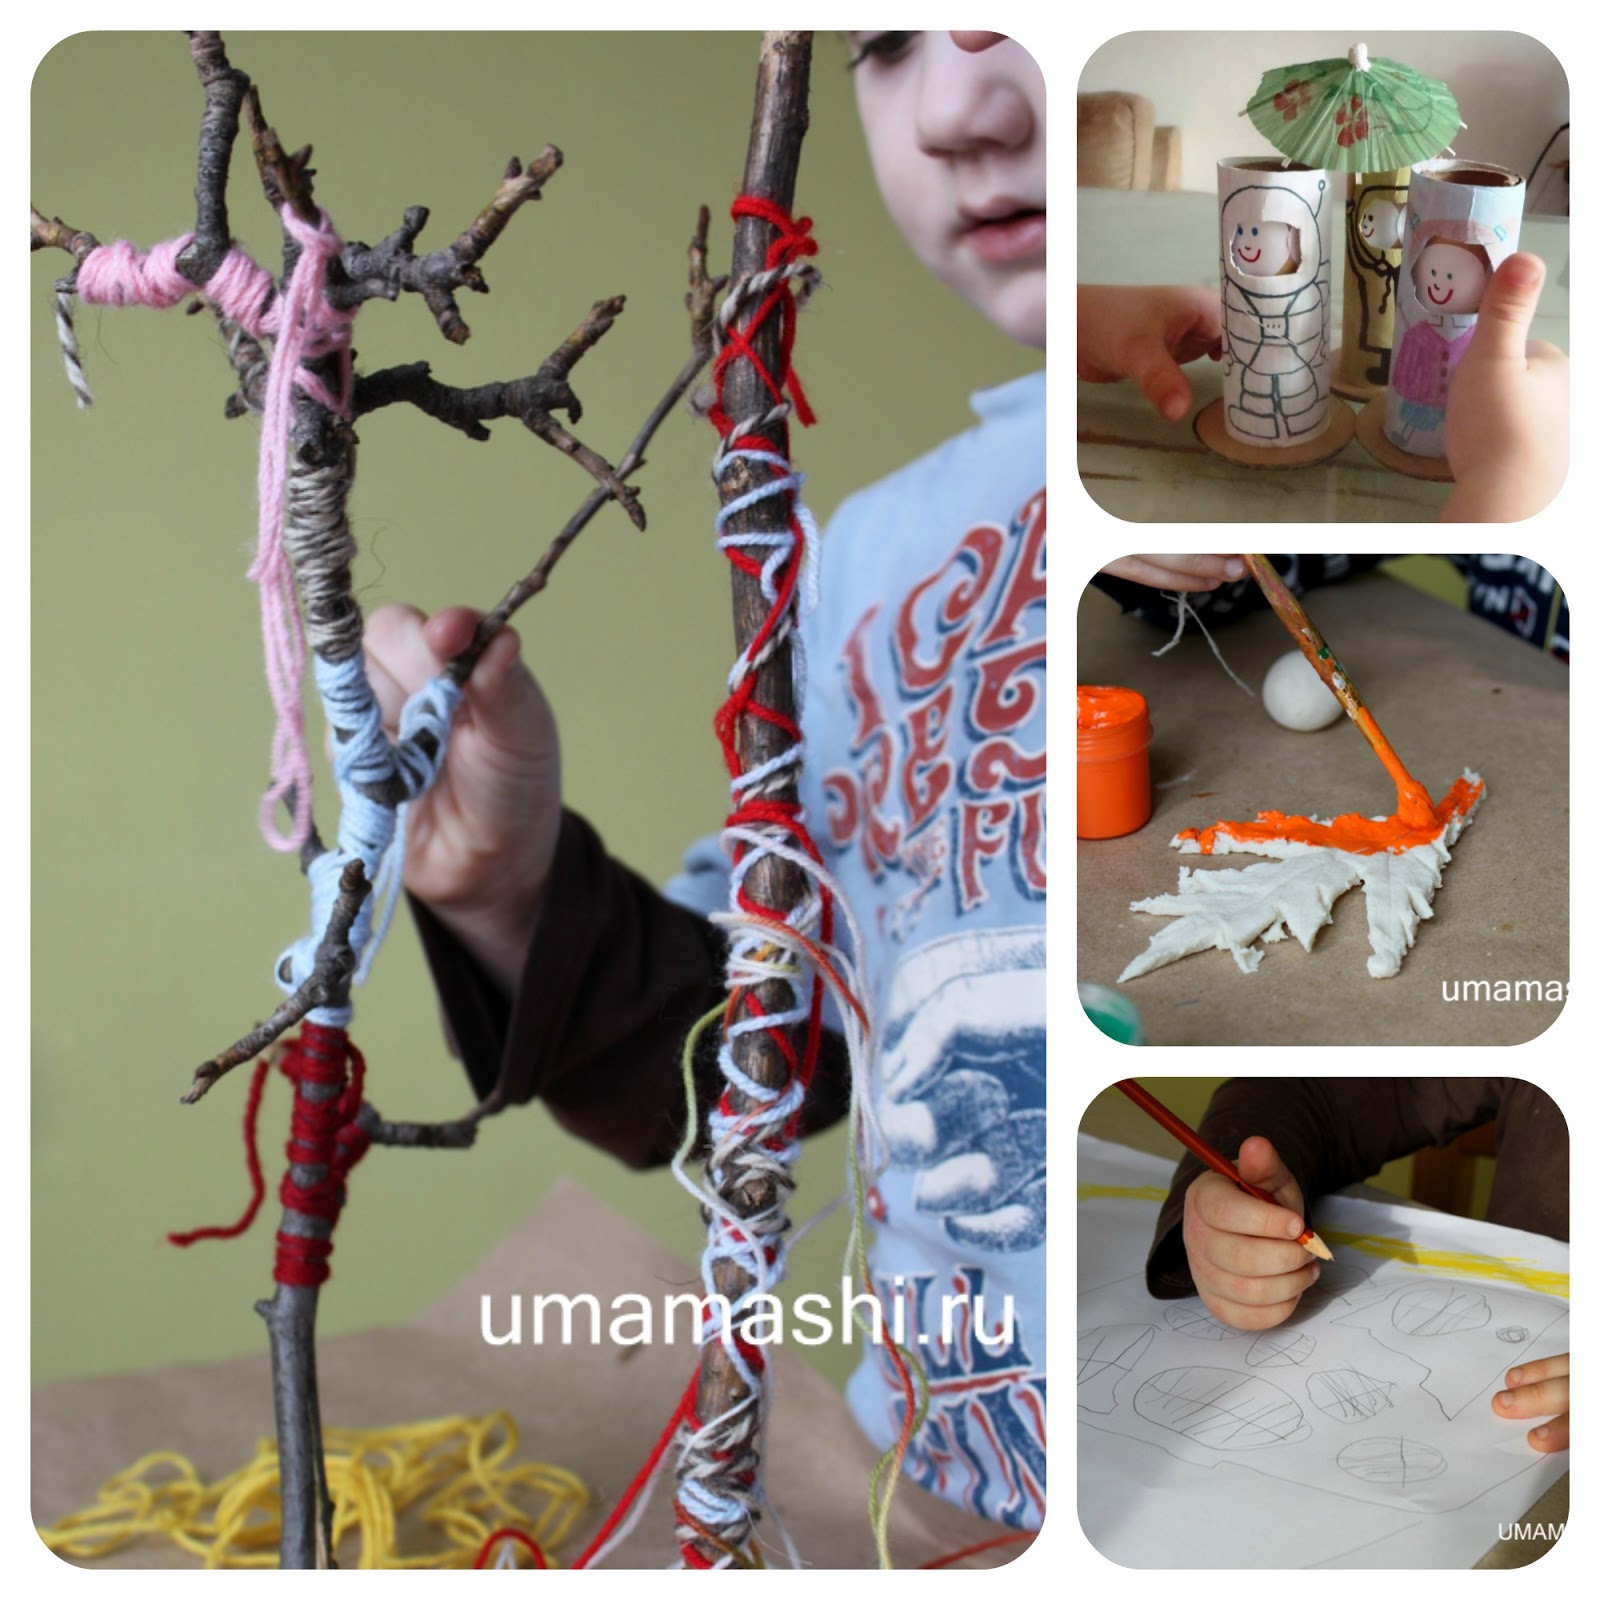 juegos, infantiles, actividades para niños, manualidades